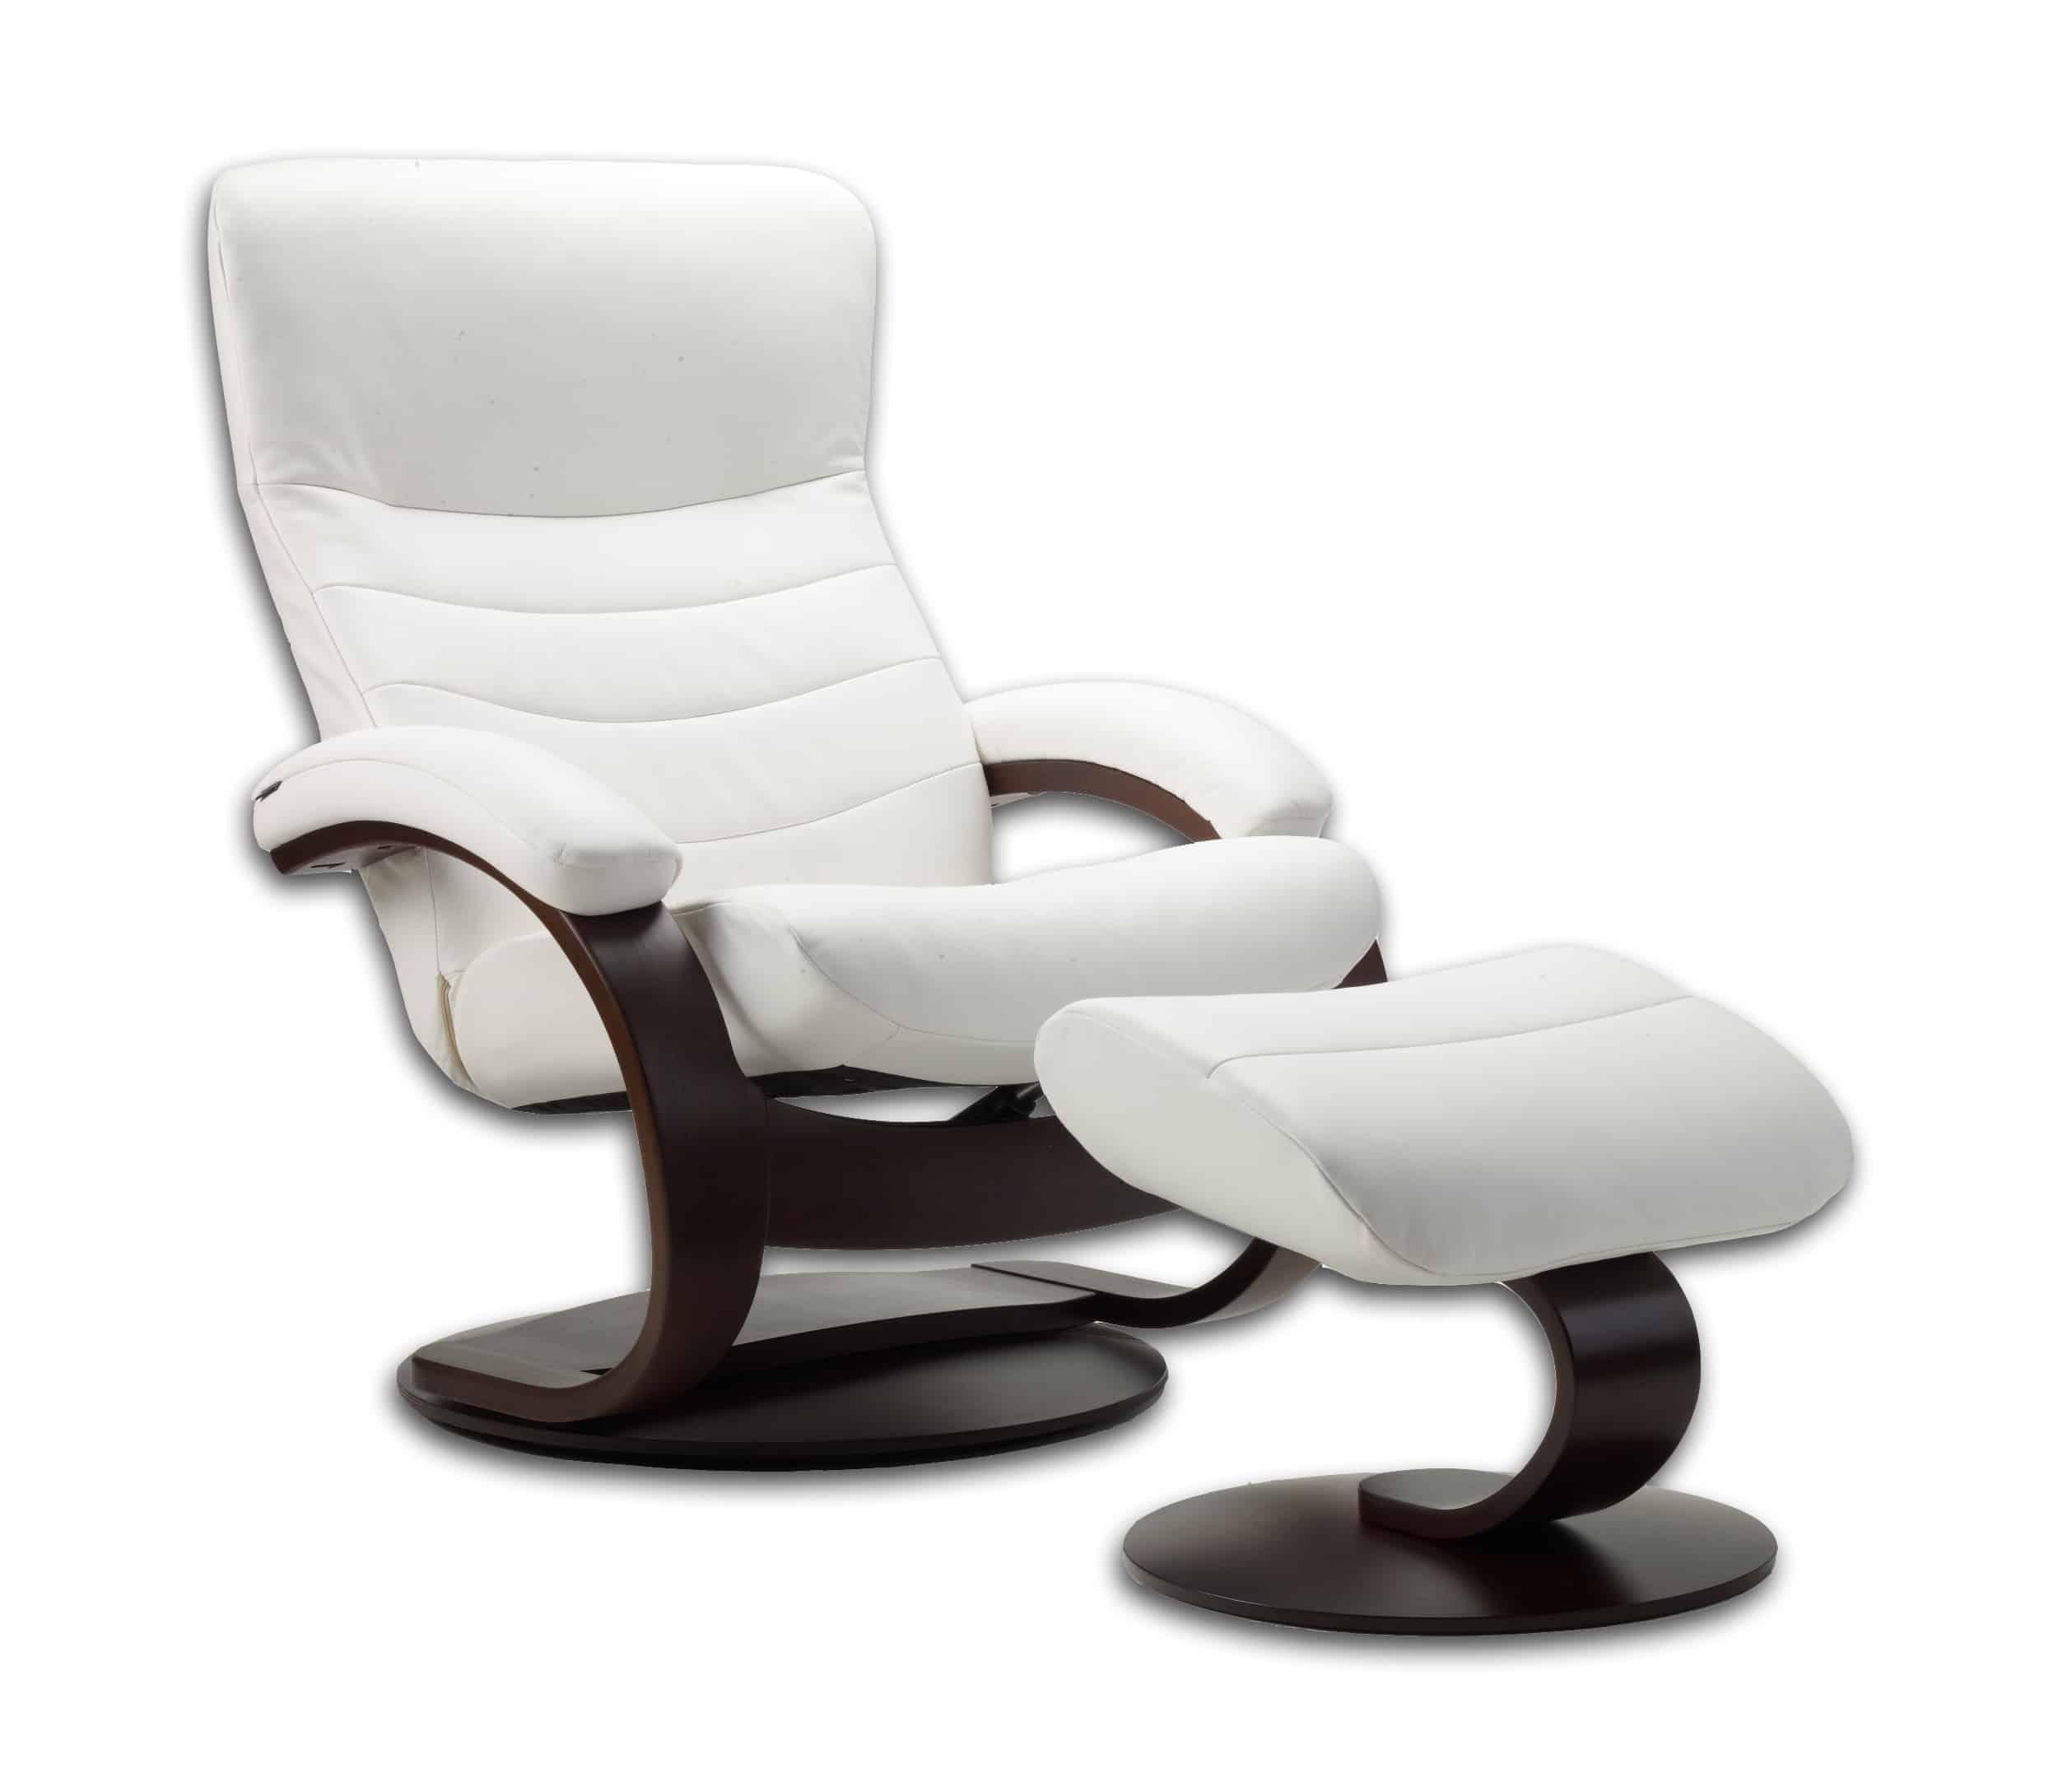 fjords trandal recliner  chair land furniture - fjords trandal recliner  white